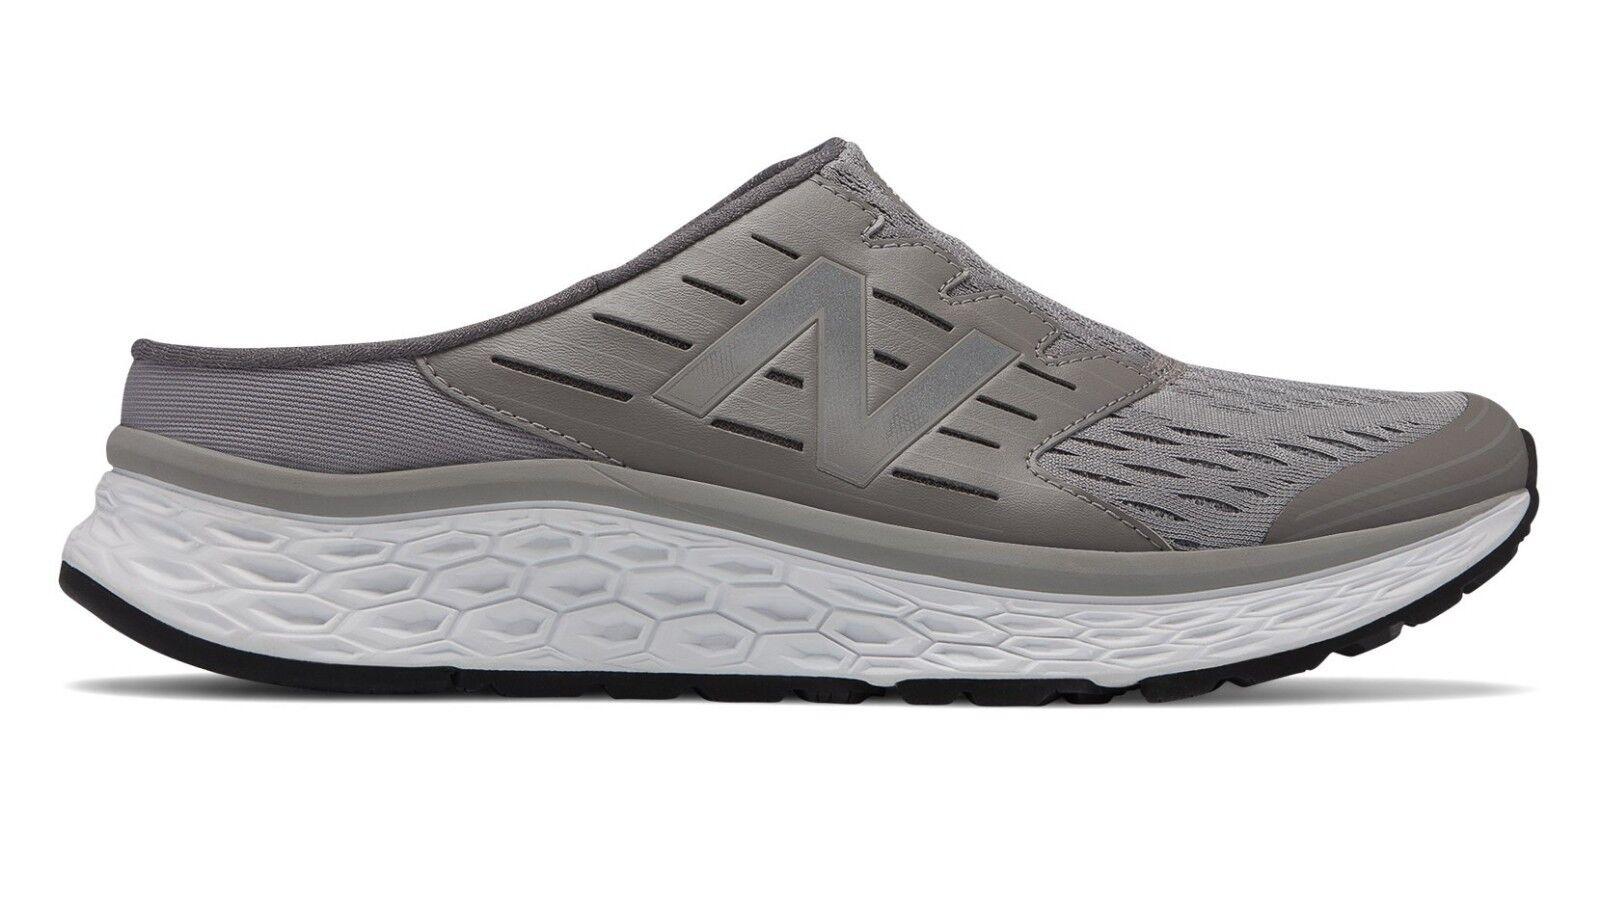 New Balance MA900GY Men's Sport Slip 900 Grey Slip On Walking shoes